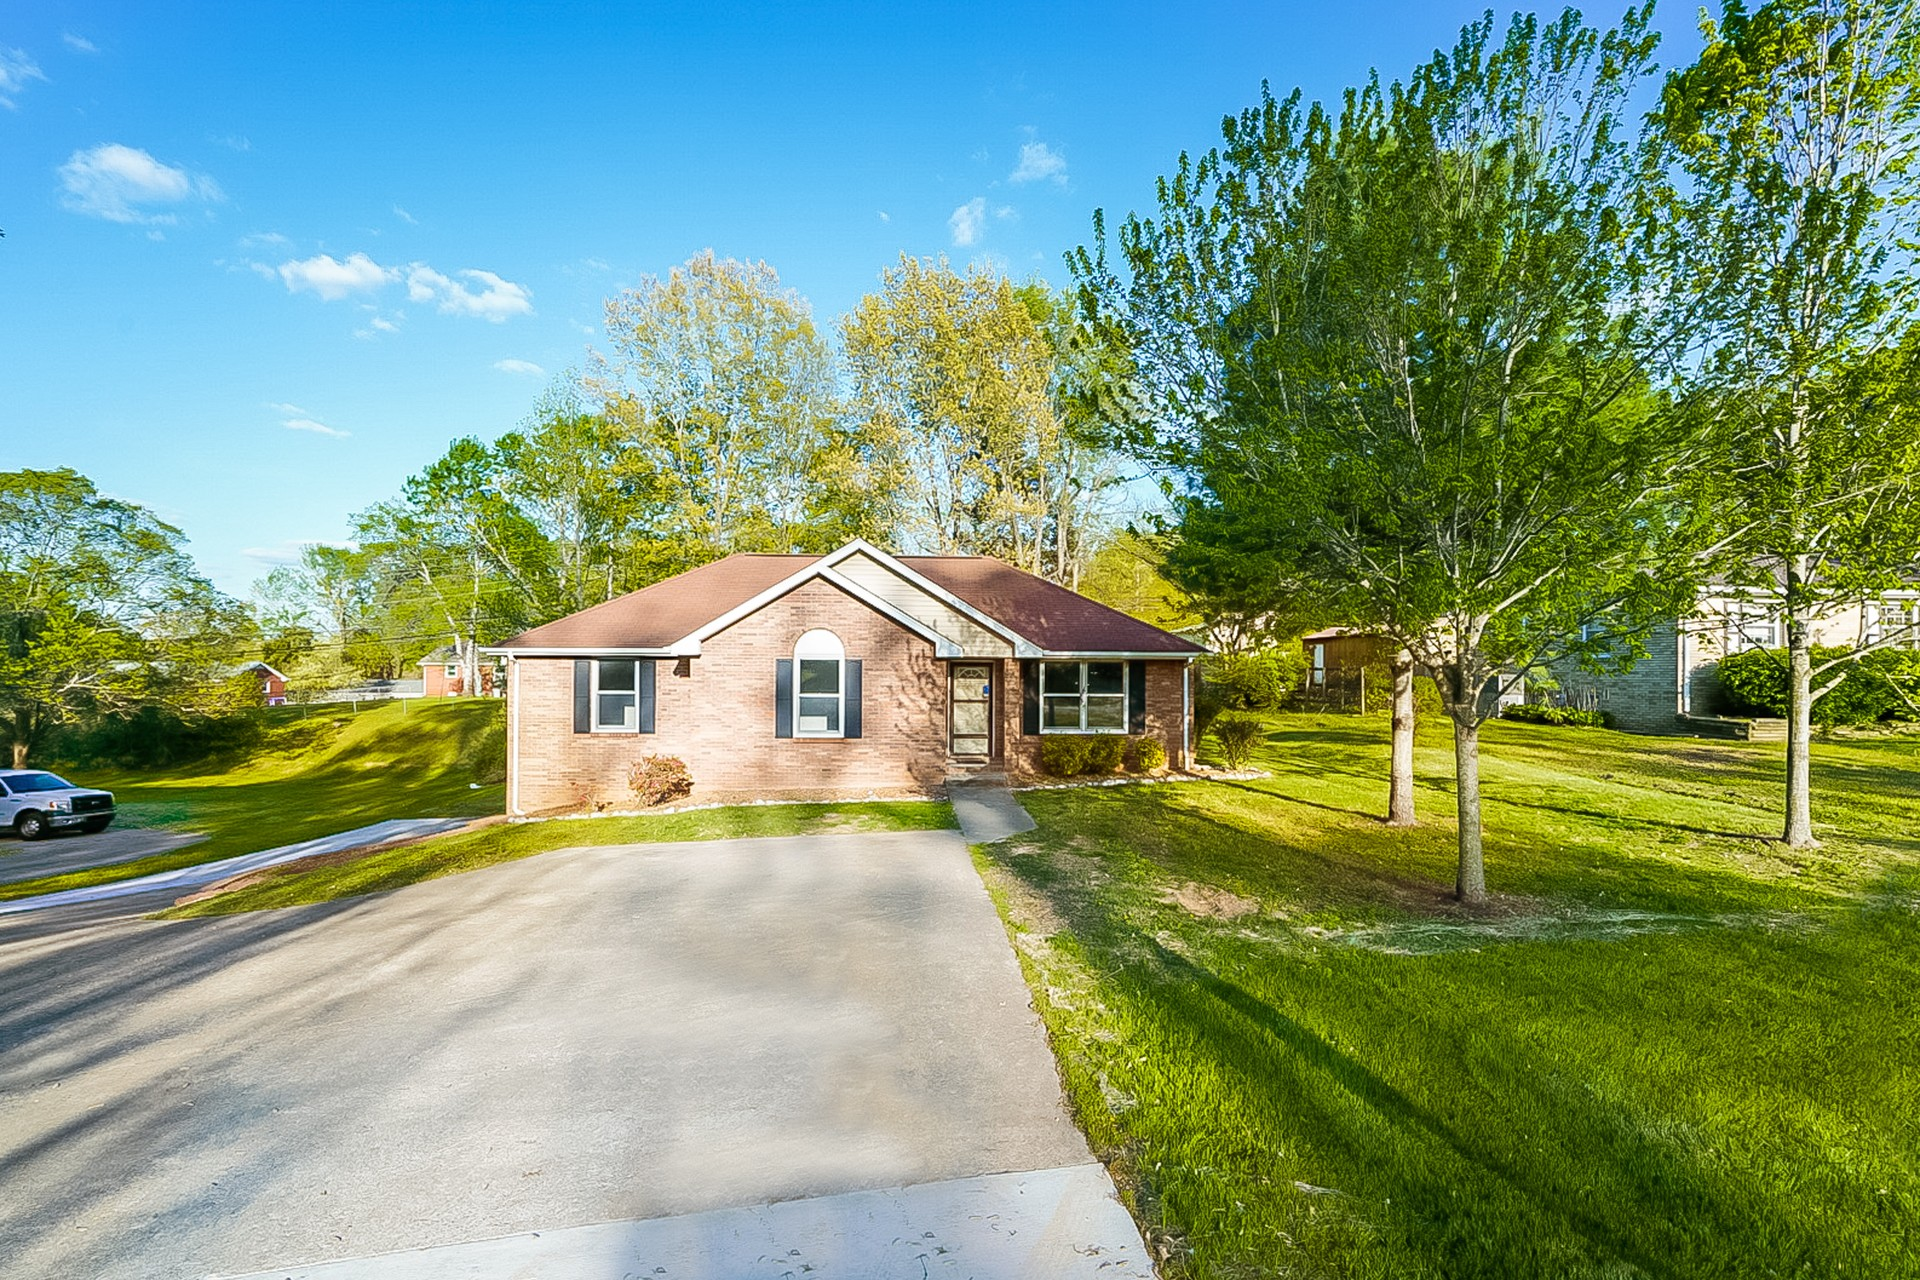 517 Aurelia Lynn Dr Property Photo - Clarksville, TN real estate listing